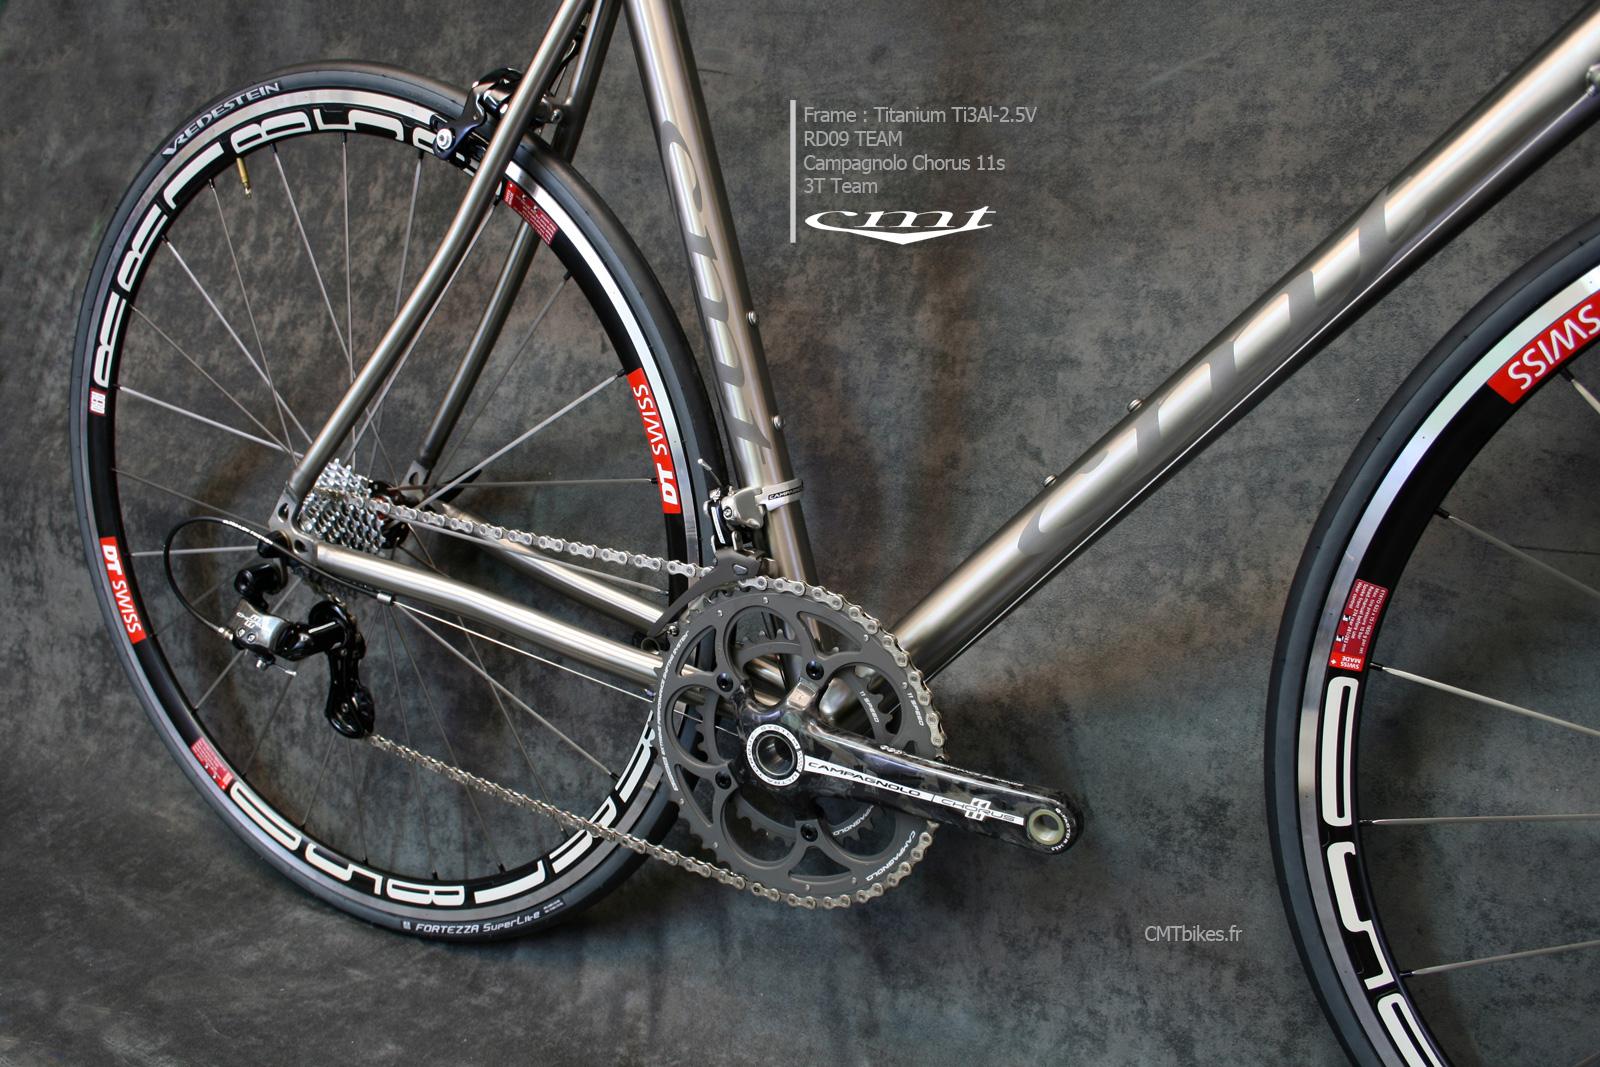 grade9 titanium bikes rd09 team le v lo de la rentr e. Black Bedroom Furniture Sets. Home Design Ideas